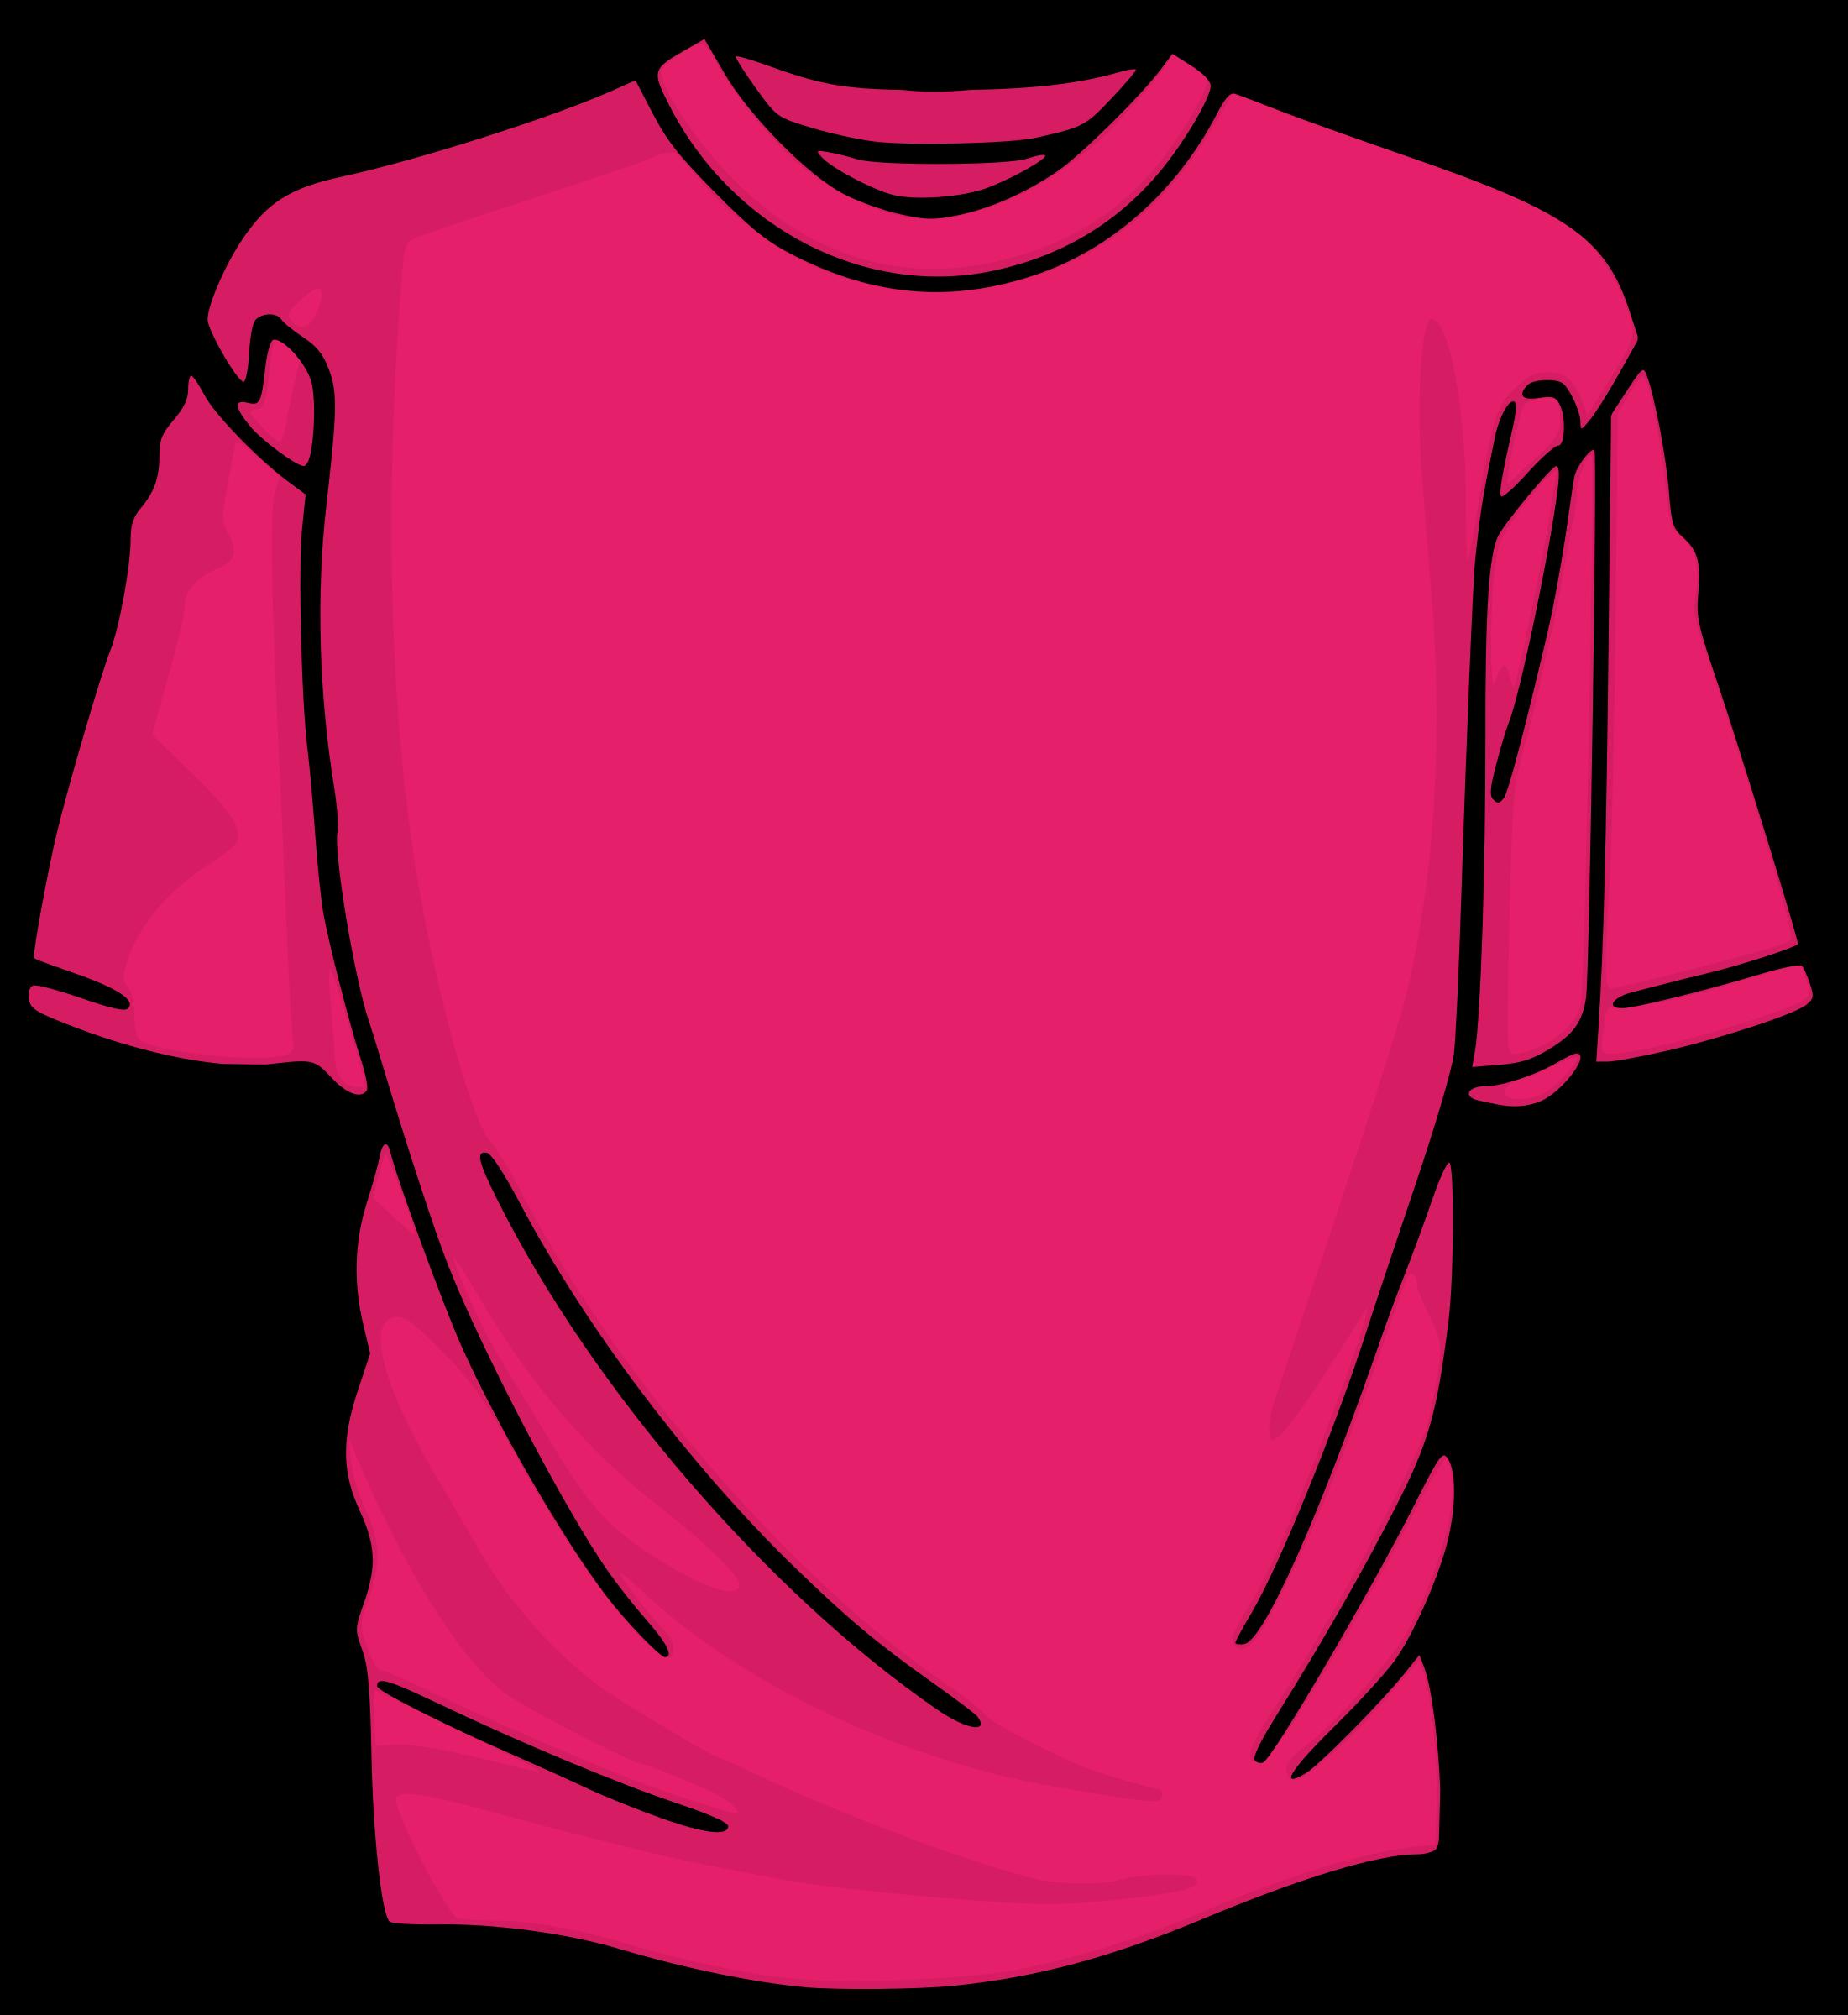 Image result for pink tshirt clip art